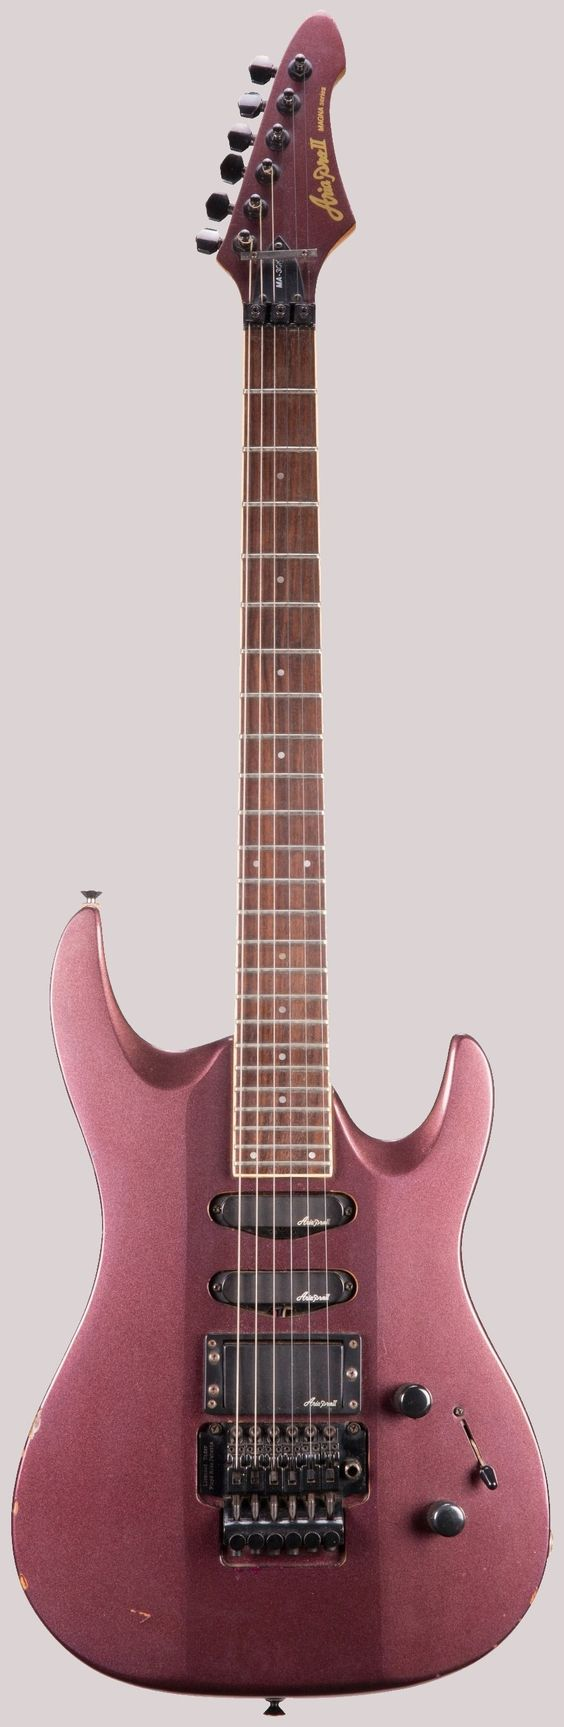 aria pro ii magna na-30r superstrat ukulele corner